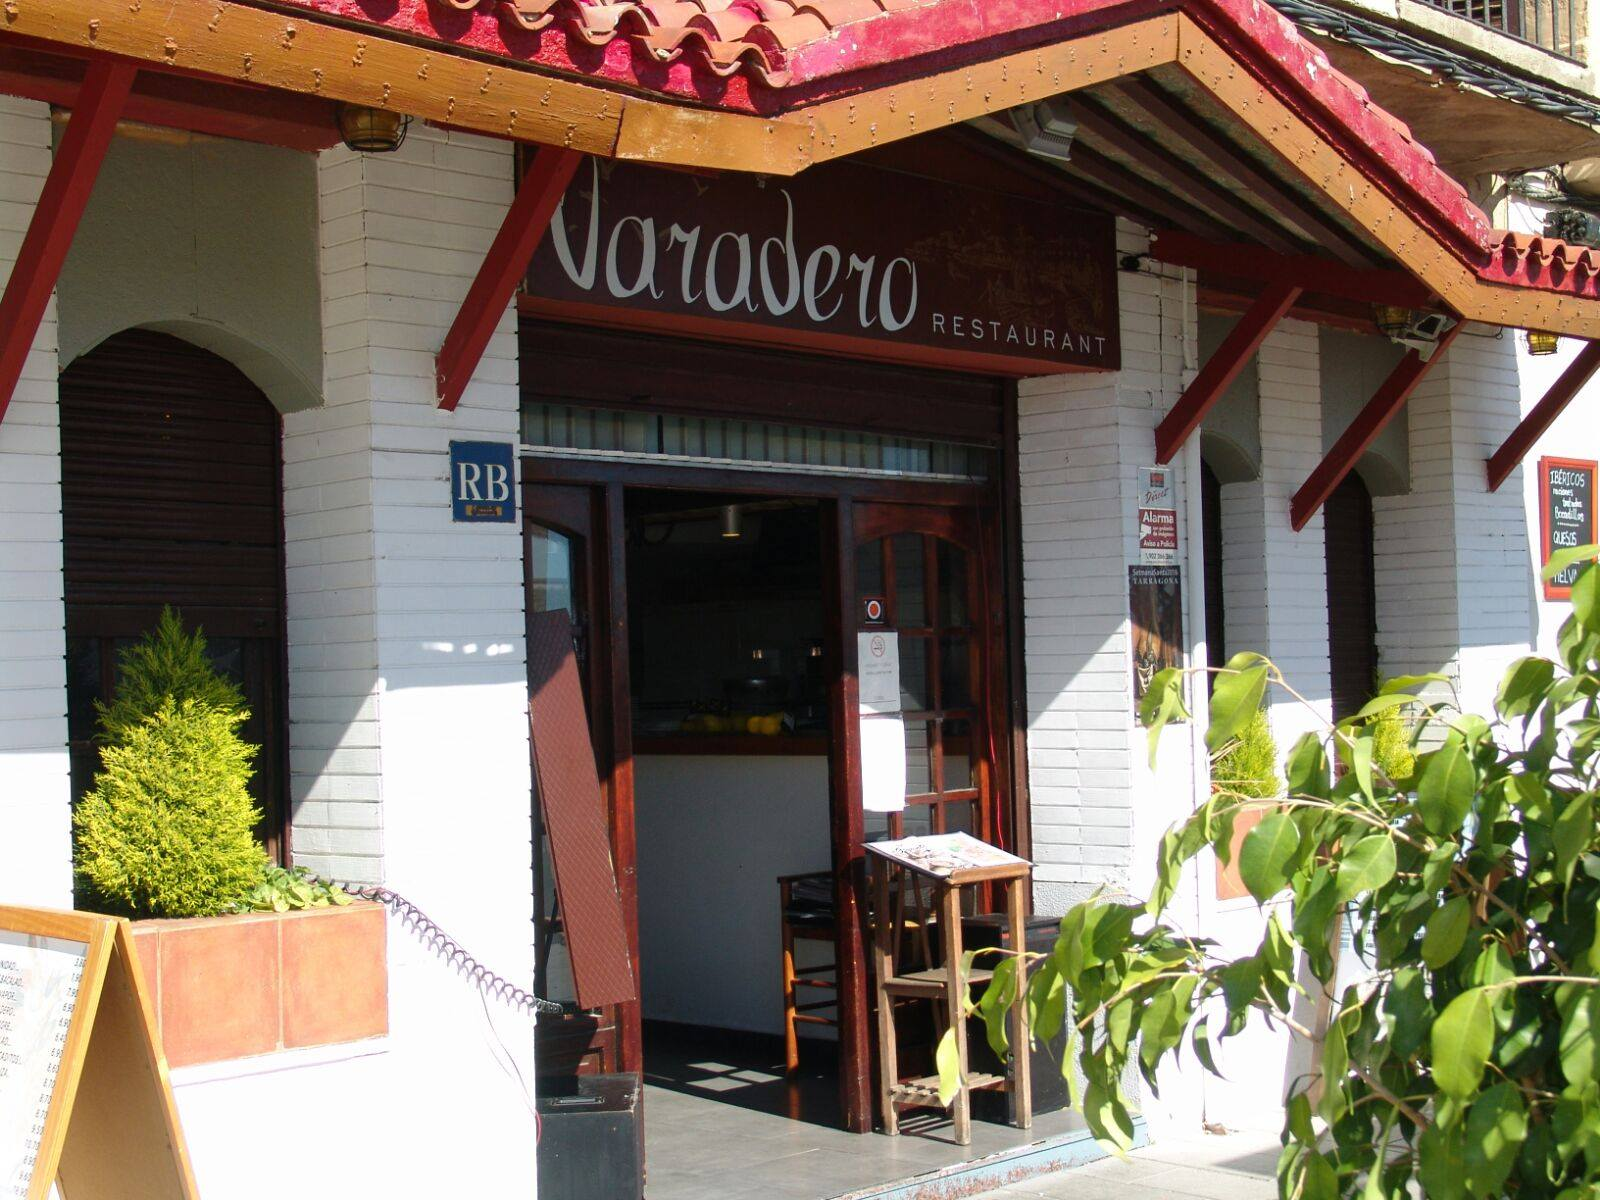 entrada restaurante varadero serrallo Tarragoana